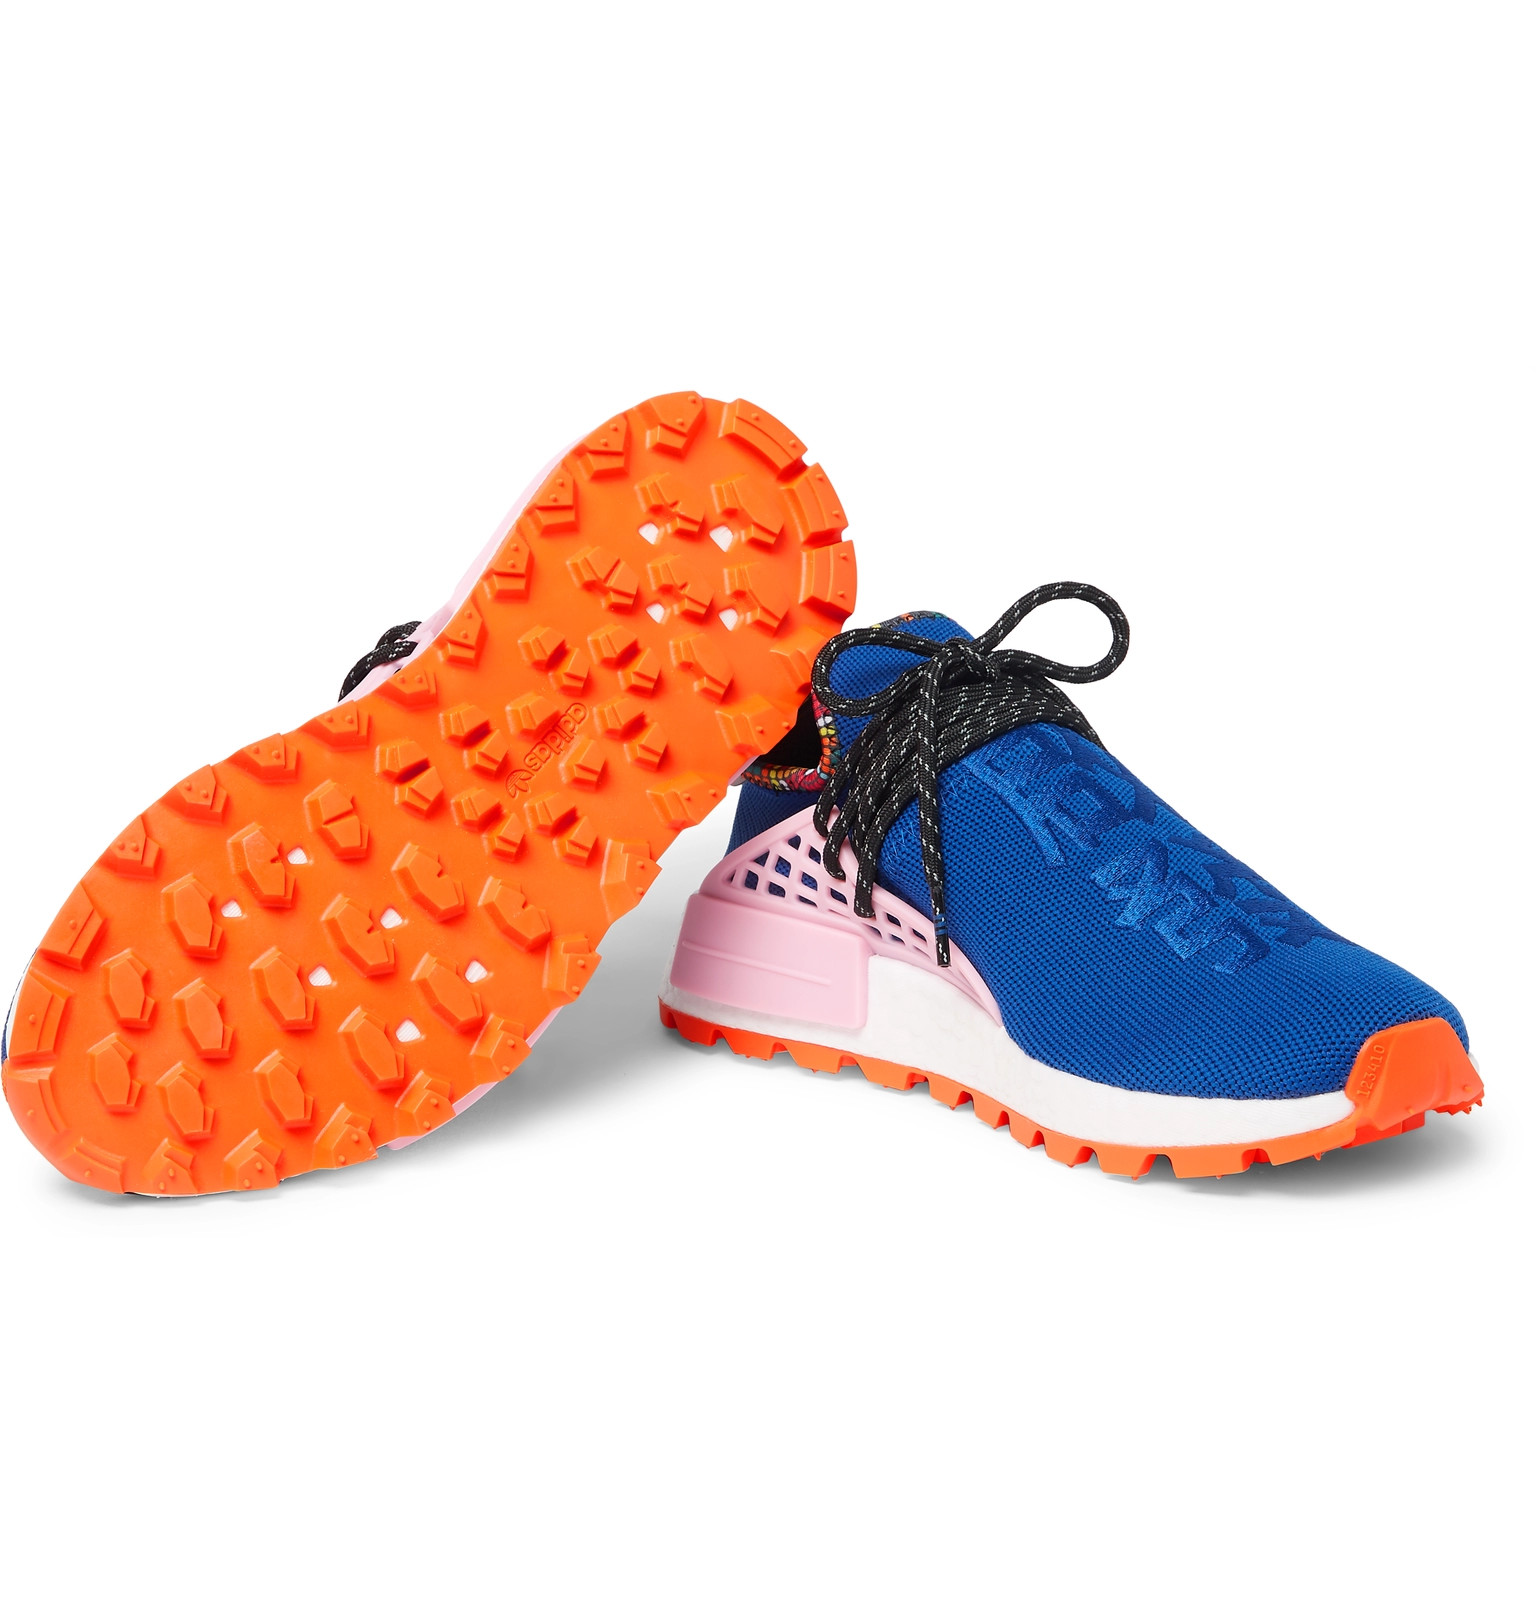 c5c94a2fd00b adidas Consortium - + Pharrell Williams Hu NMD Primeknit Sneakers